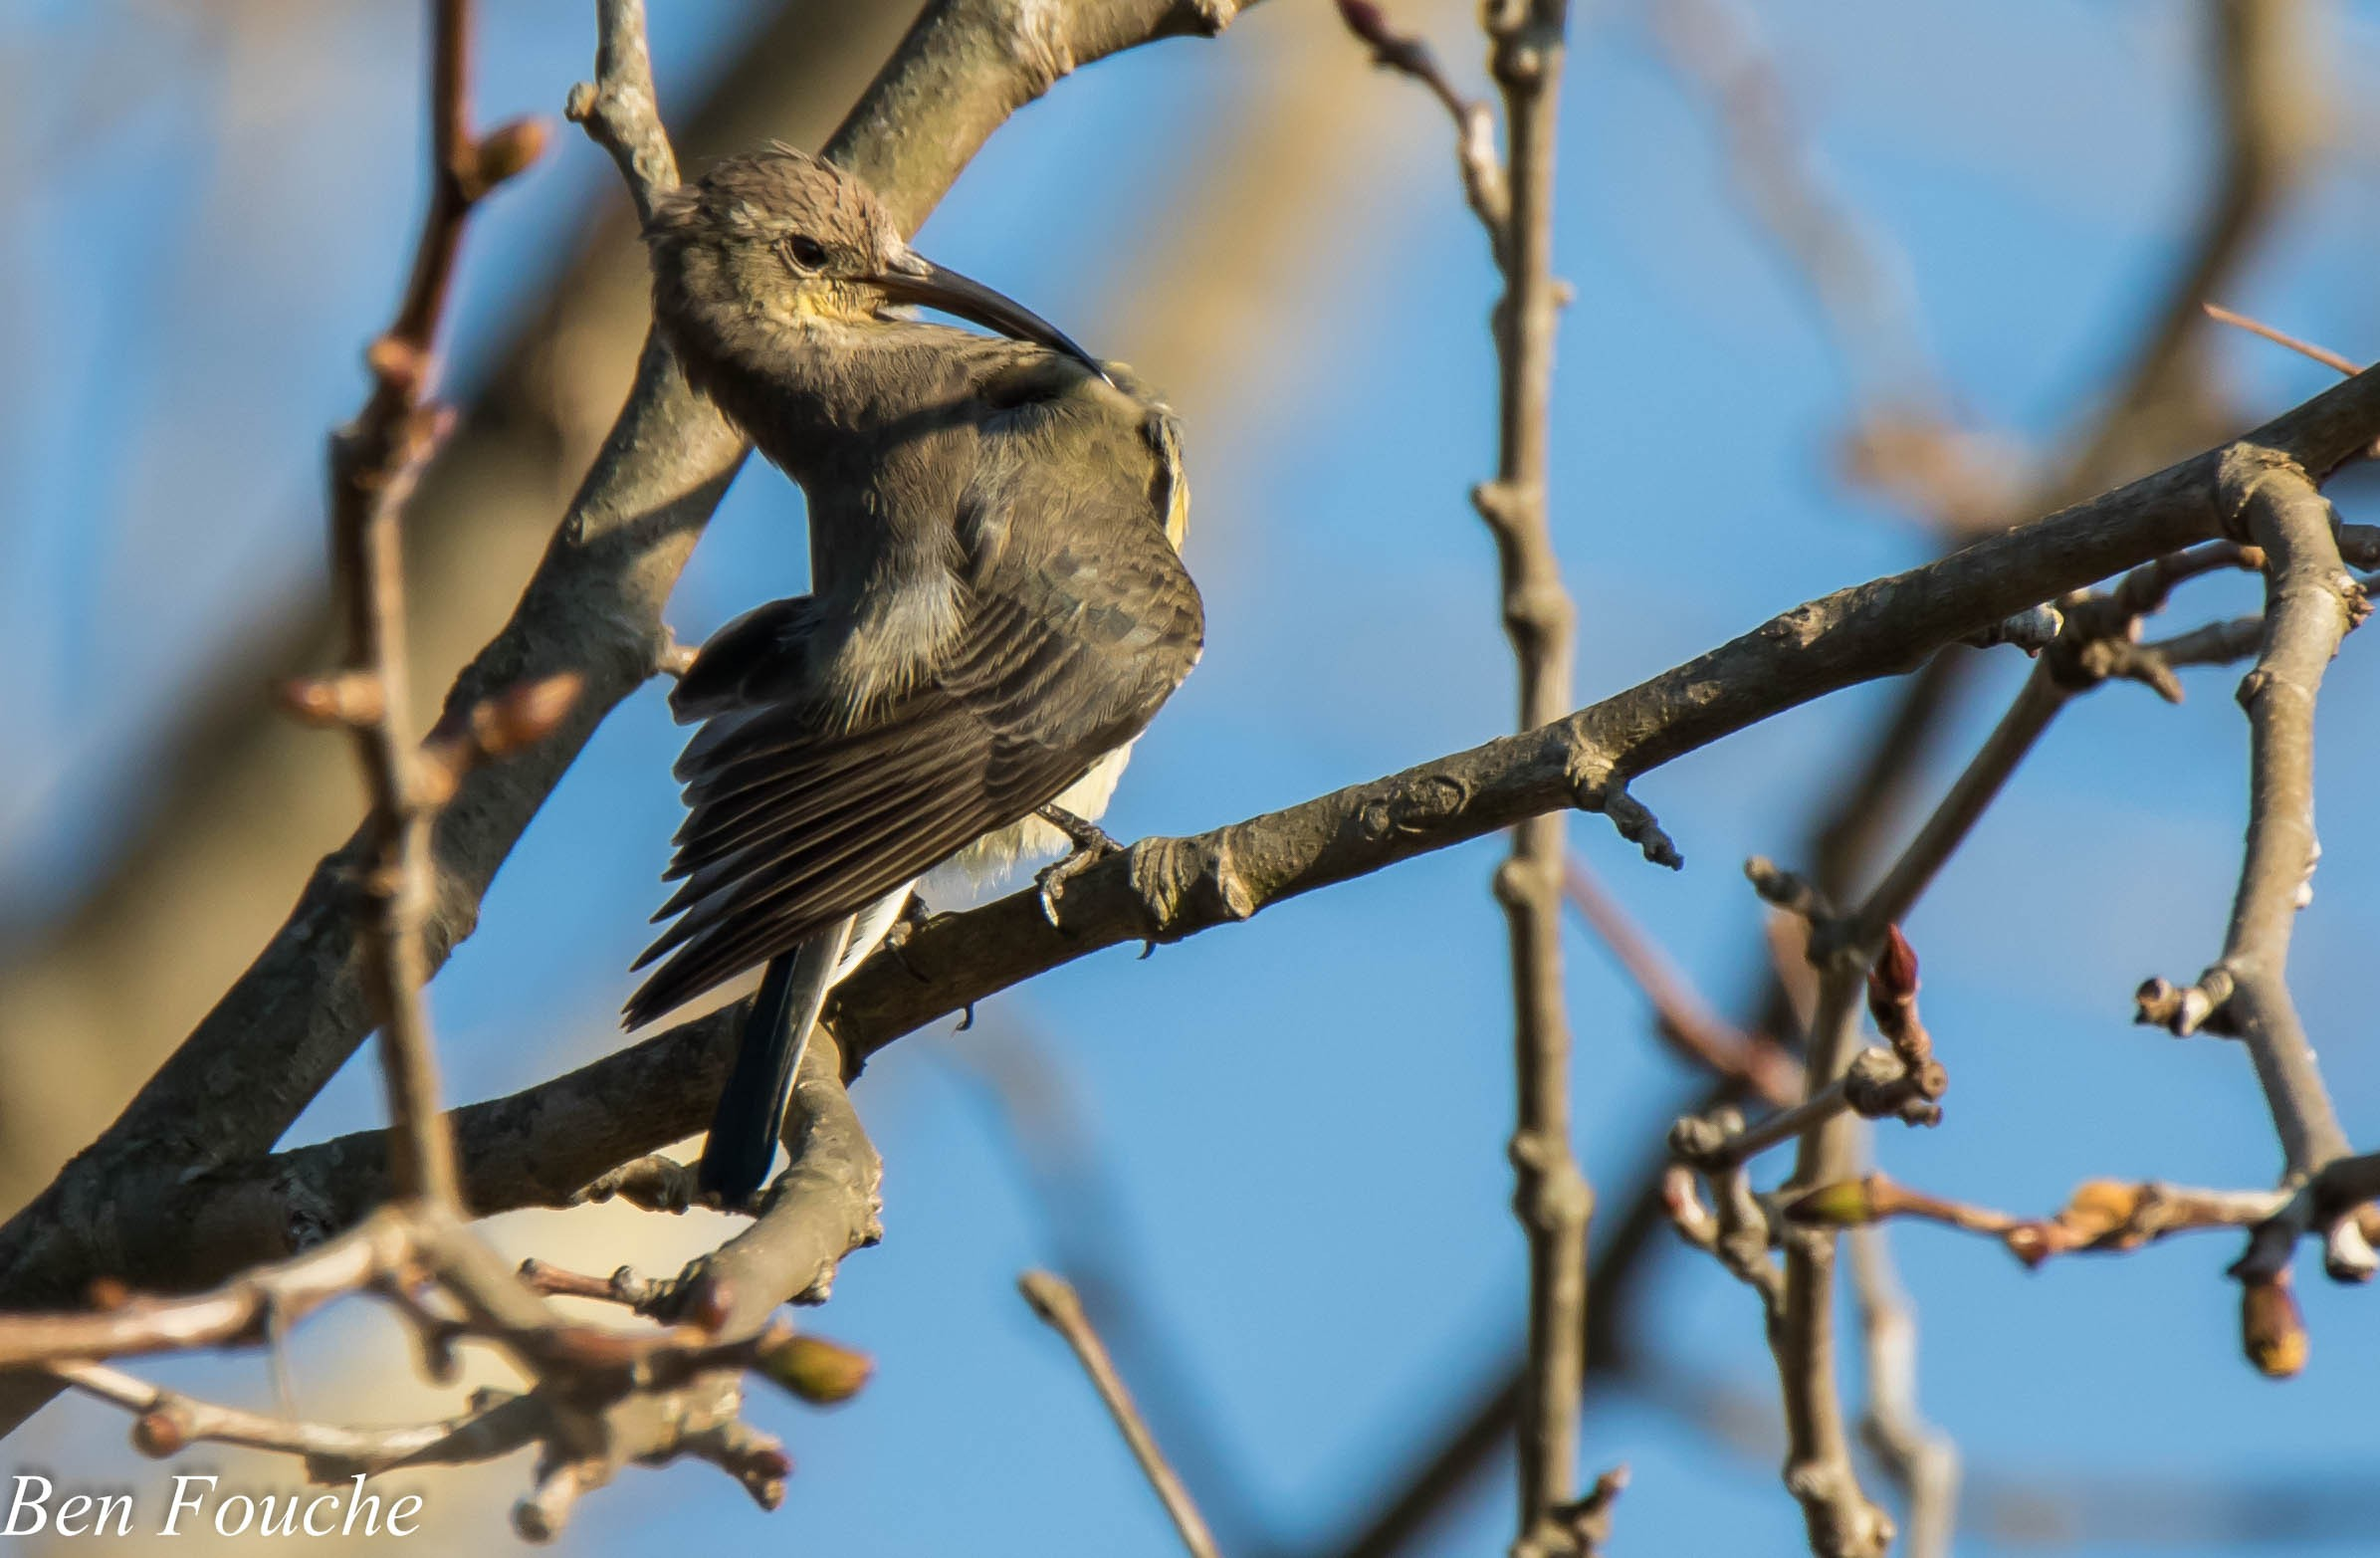 Greater Double-collared Sundbird Female